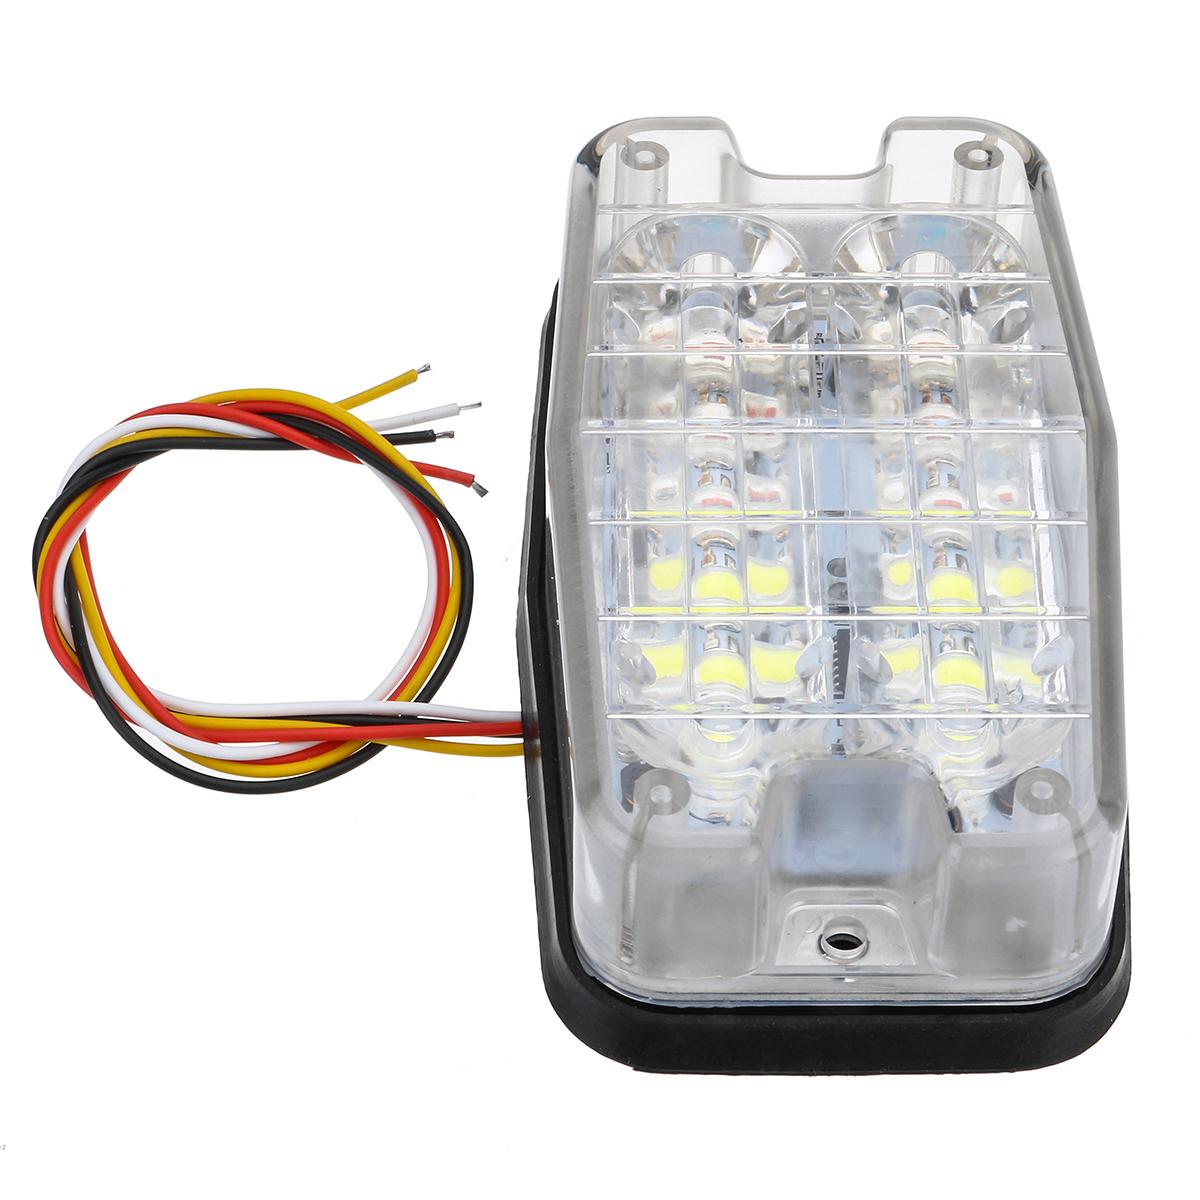 Wiring Trailer Side Marker Lights